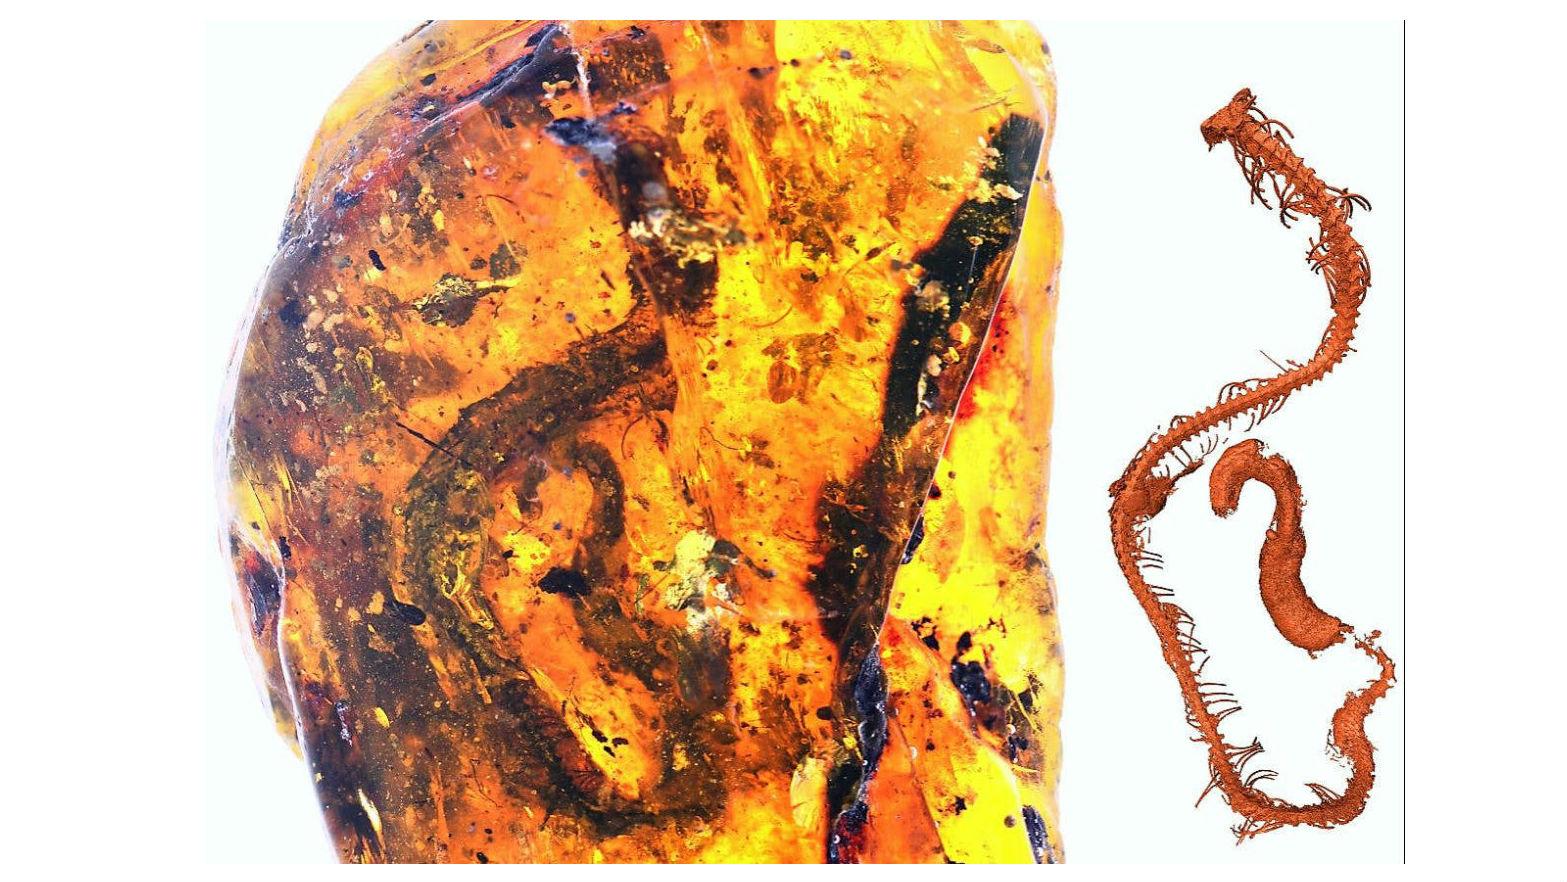 Фрагмент янтаря и 3D-реконструкция скелета змеёныша.